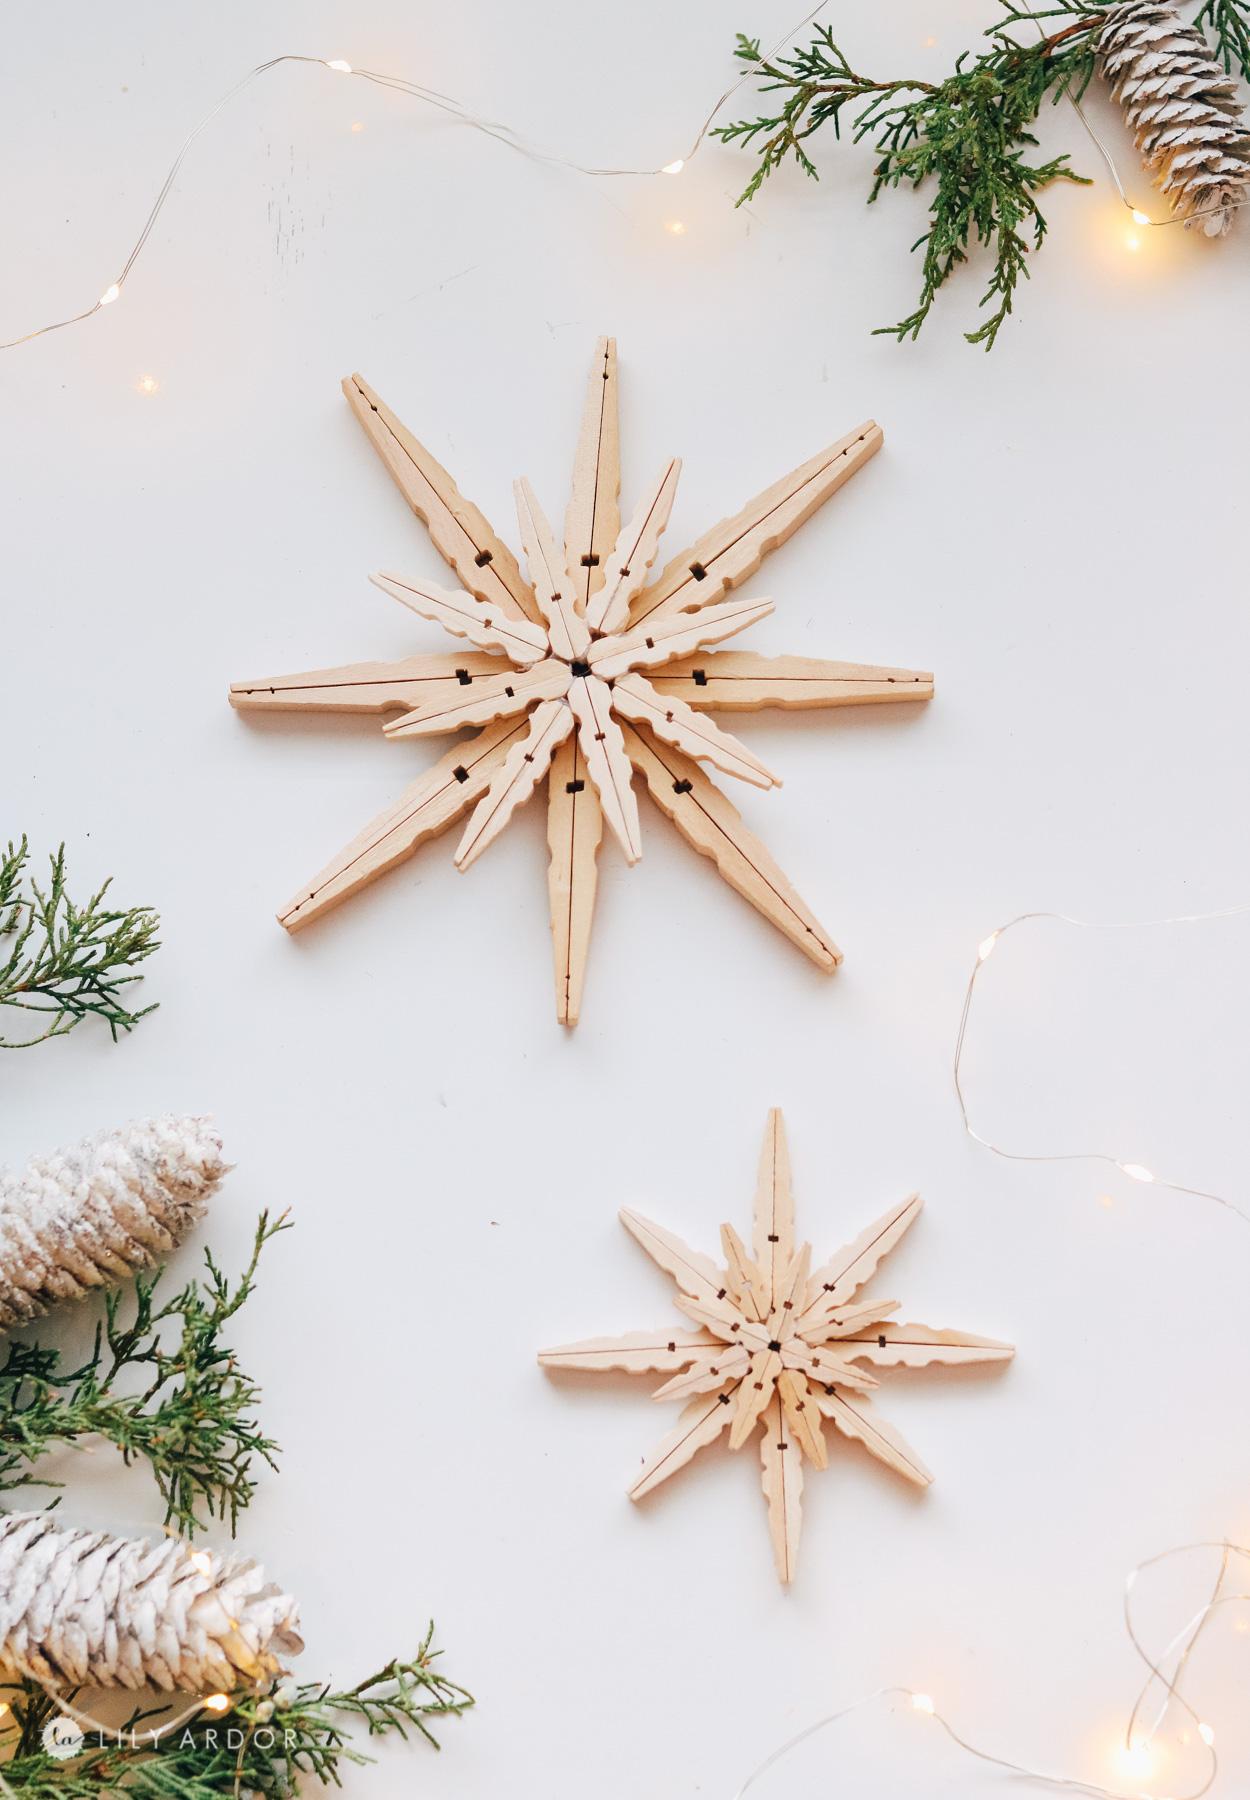 clothespin stars DIY